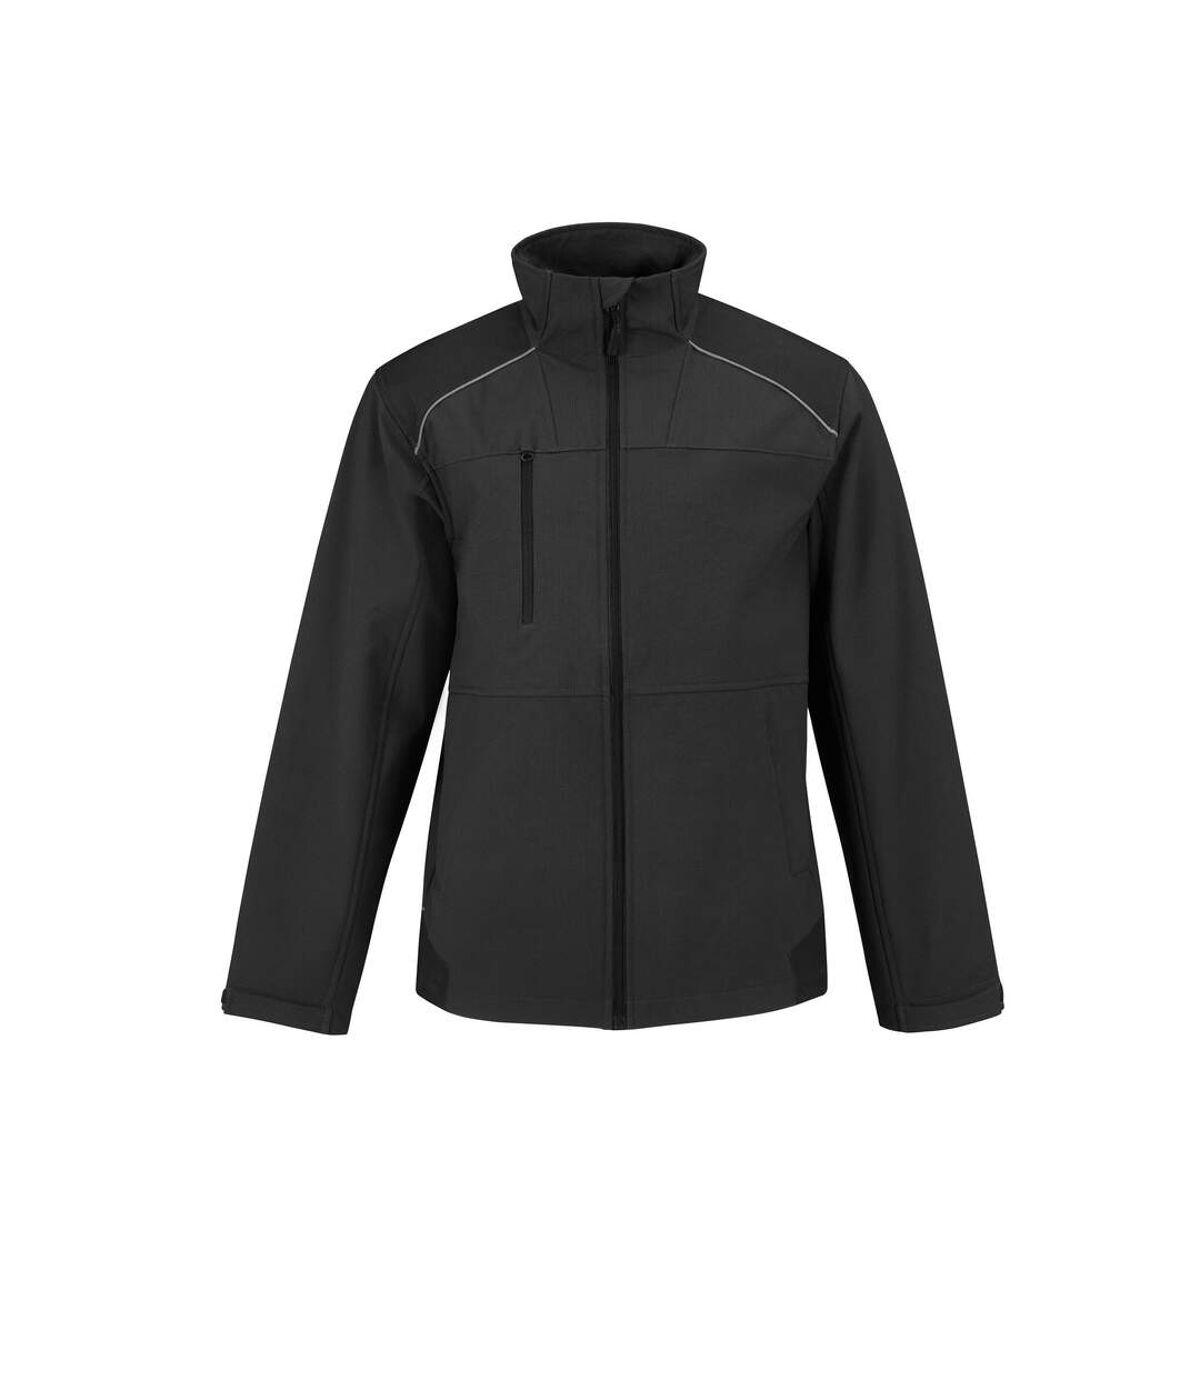 B&C Mens Shield Softshell Pro Jacket (Black) - UTRW4834